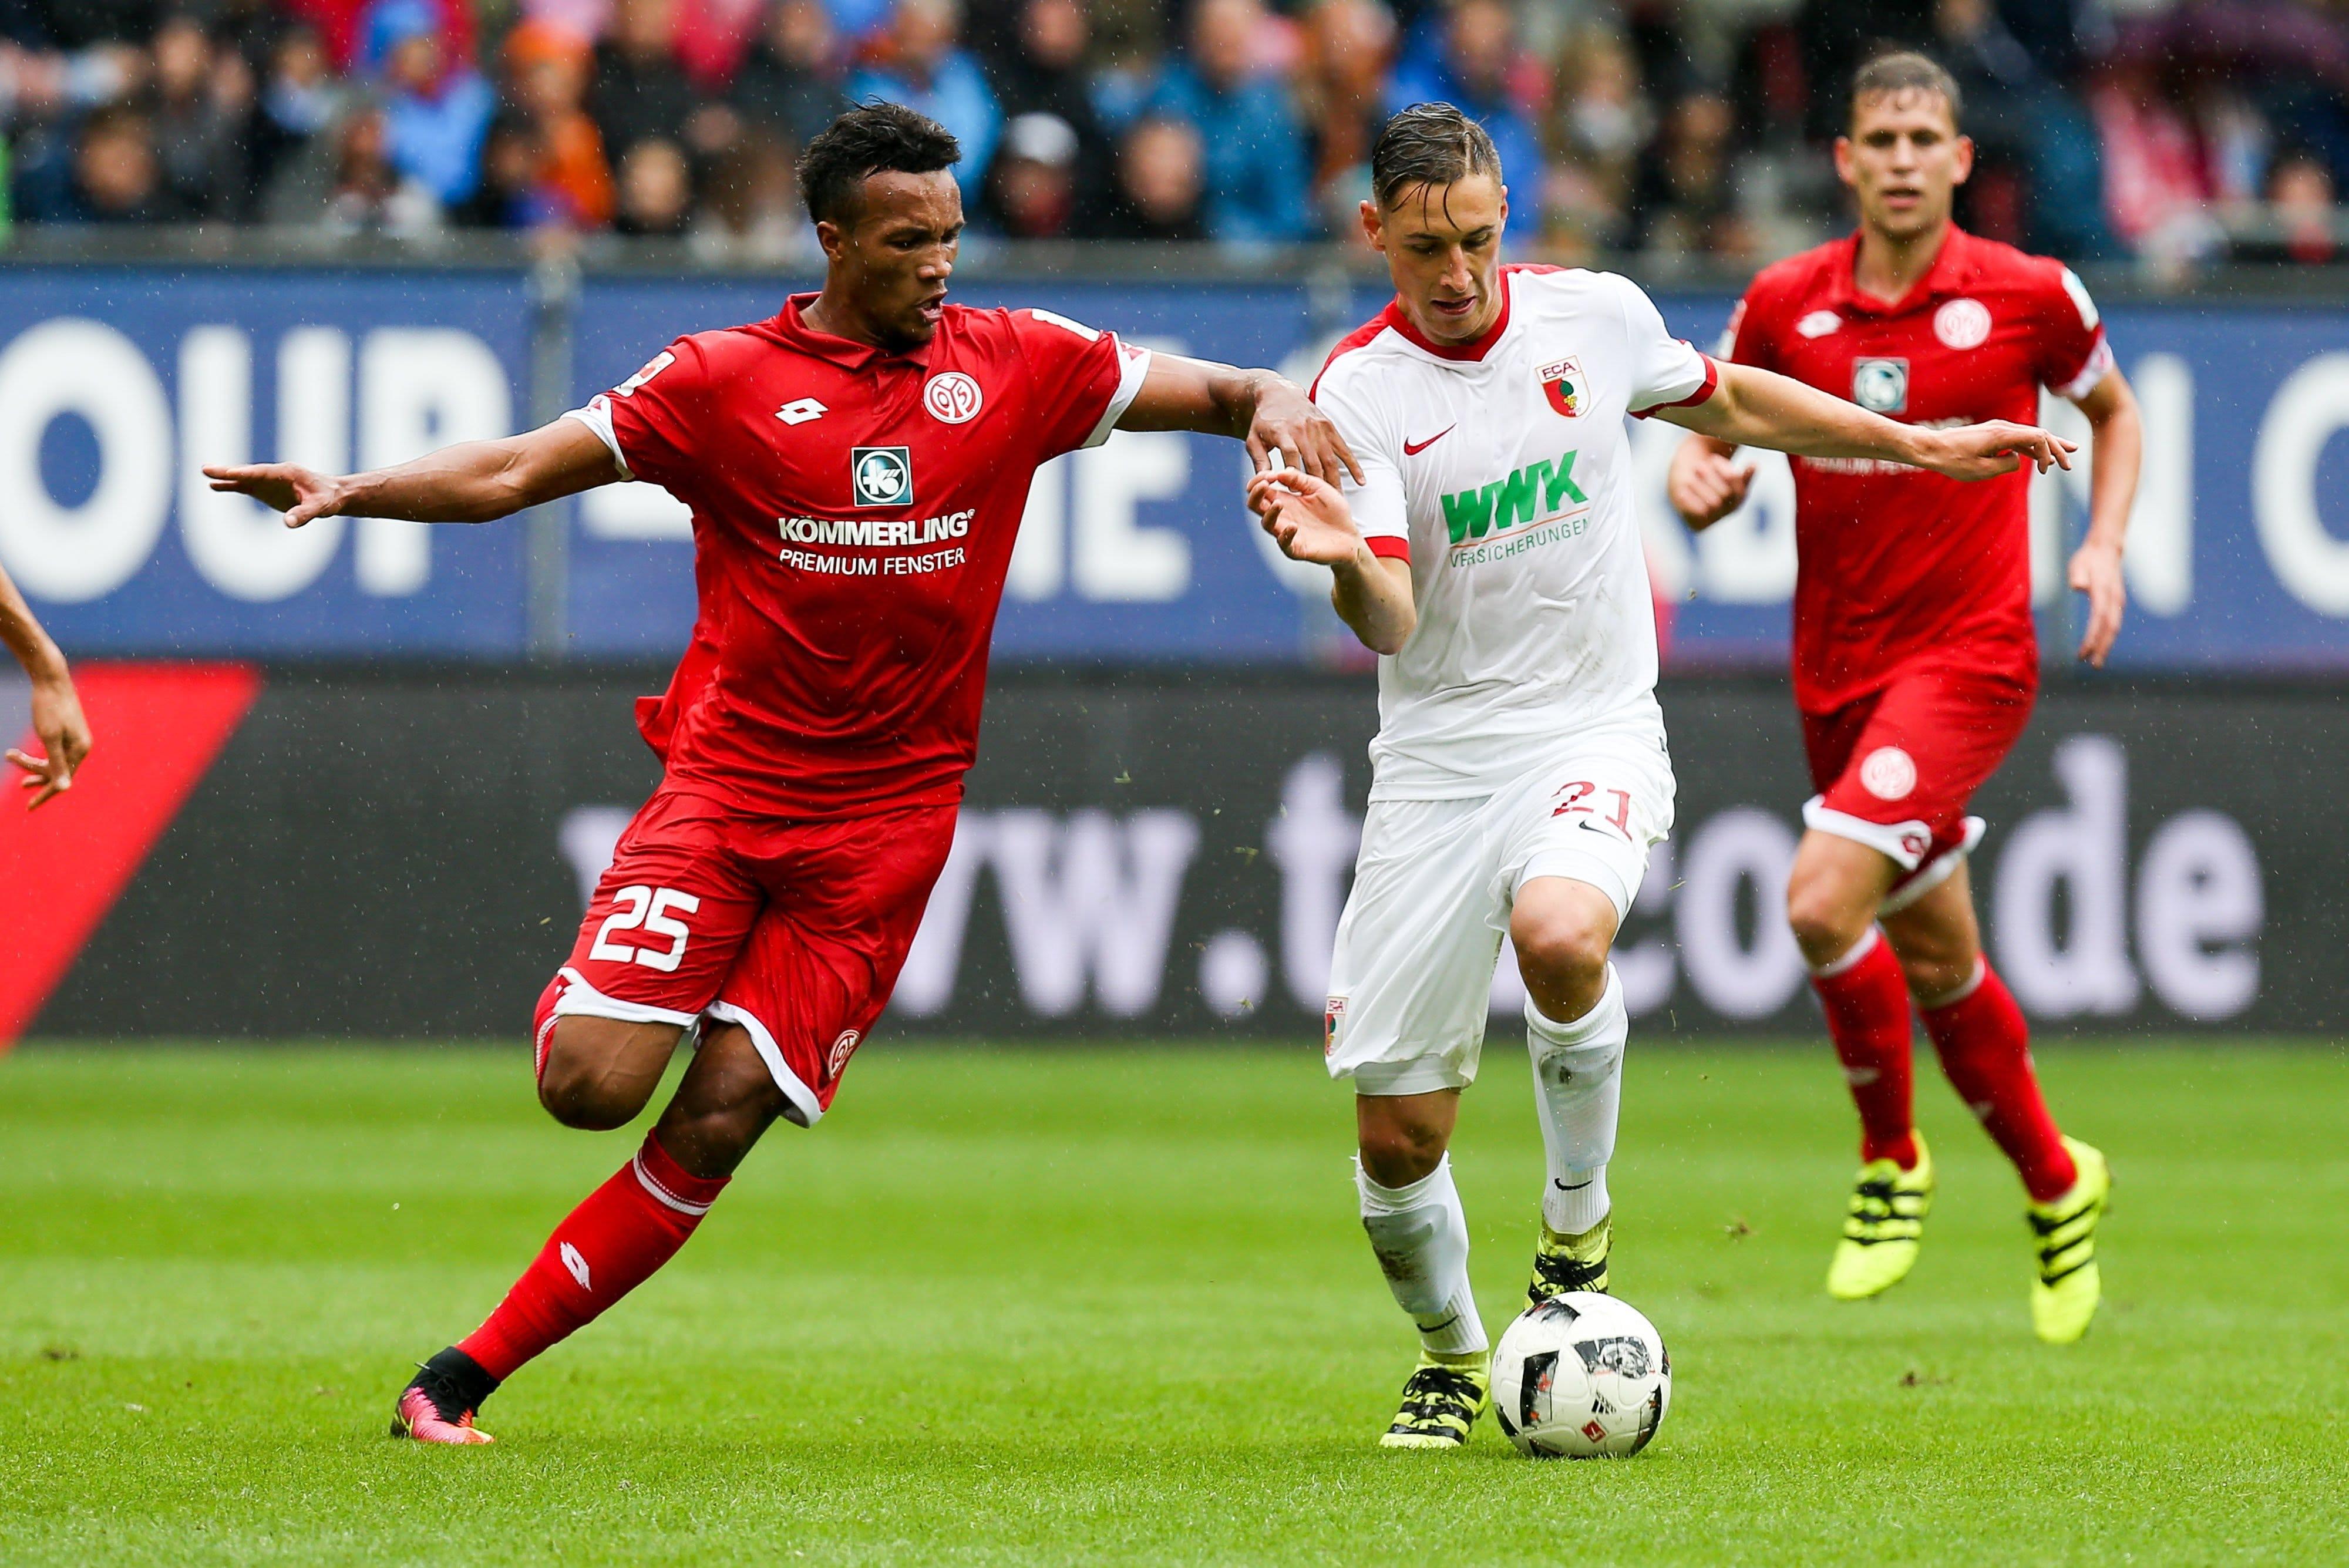 Augsburg vs Mainz Football Tips